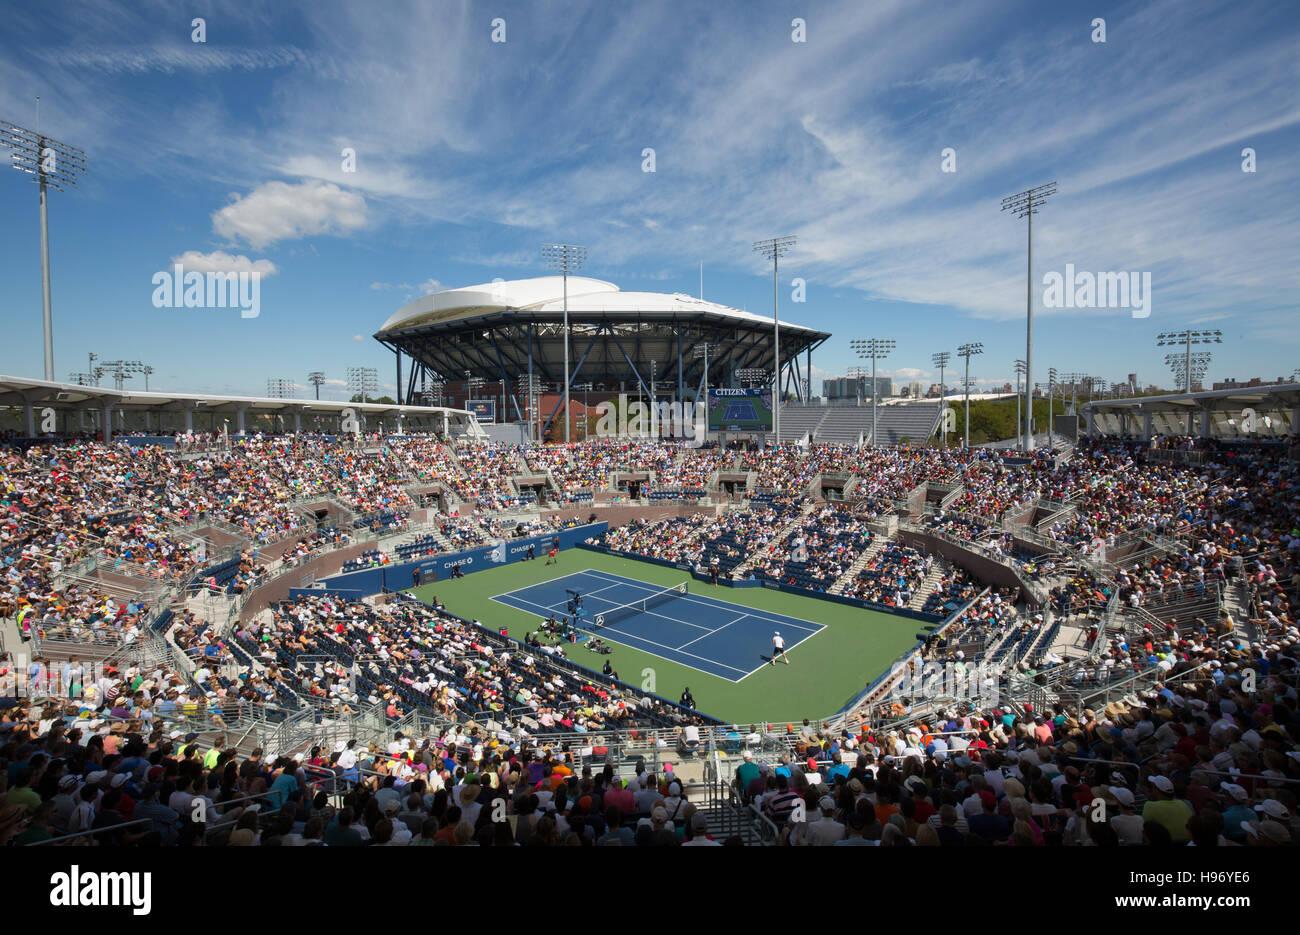 New Grandstand Stadium and Arthur Ashe Stadium, US Open Championships 2016 - Stock Image